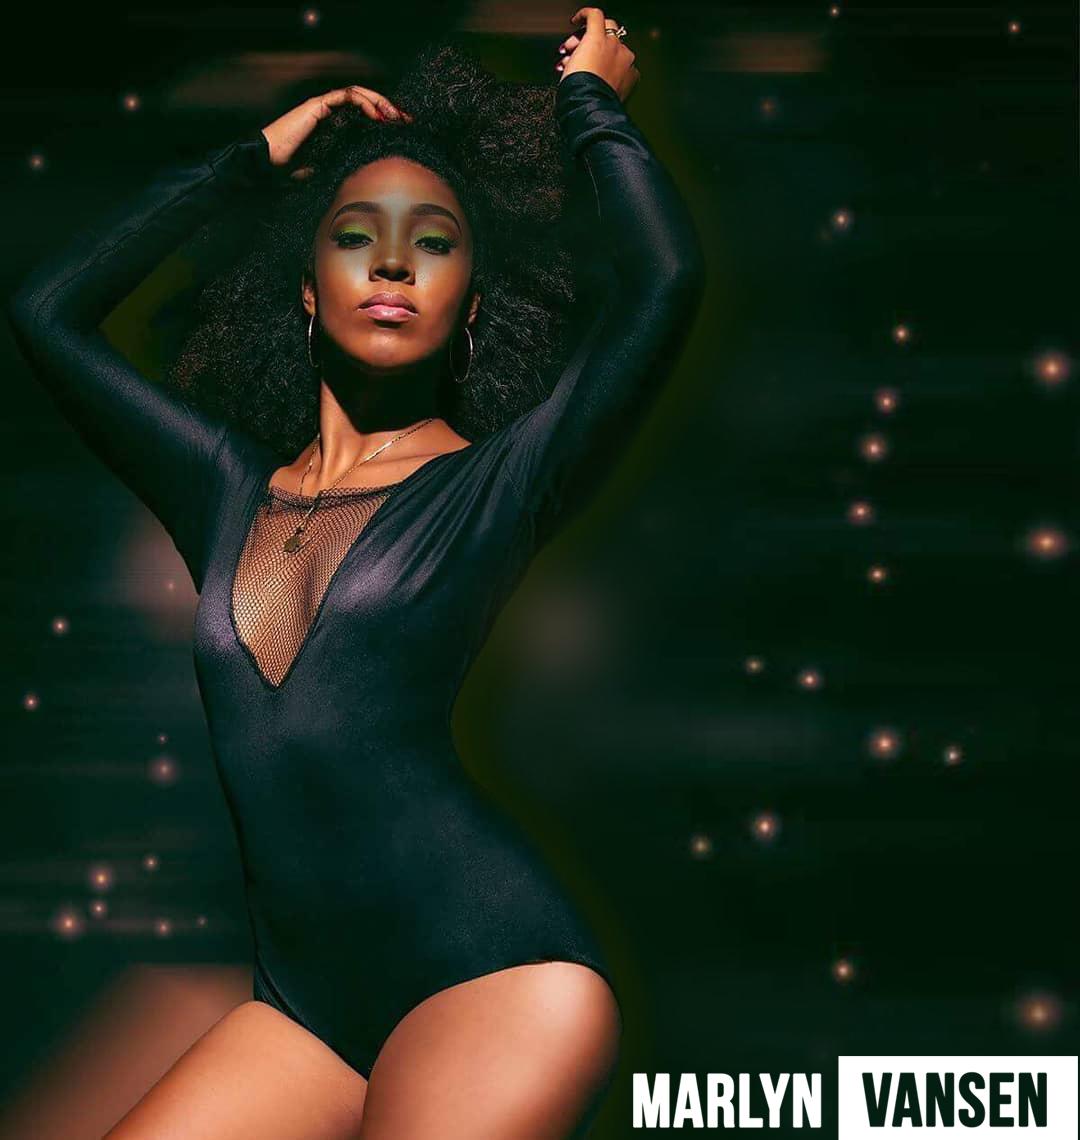 Marlyn Vansen